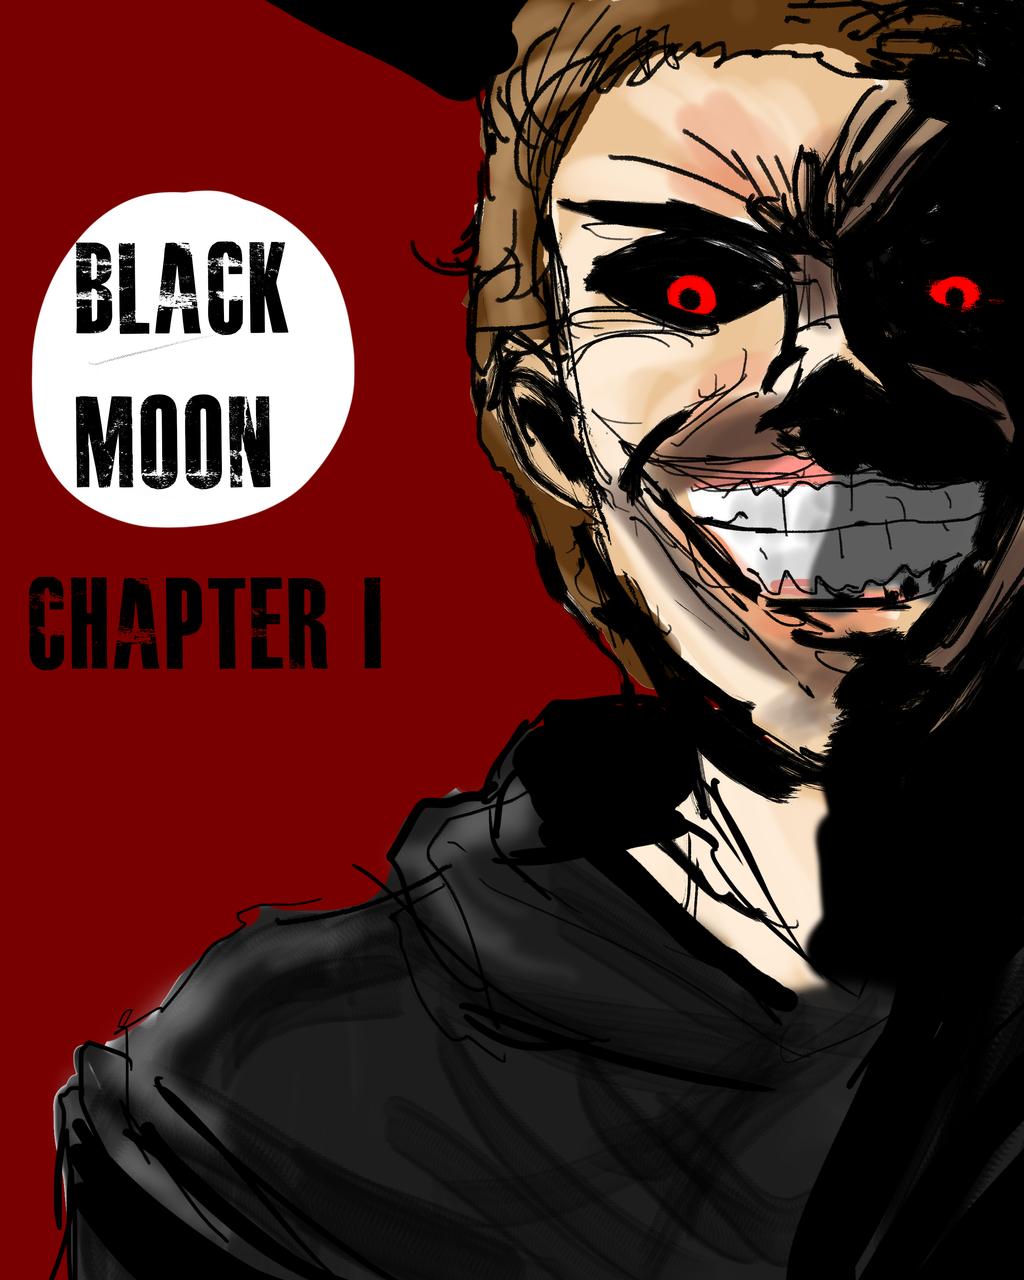 Black Moon cover #1 by ShadowClawZ